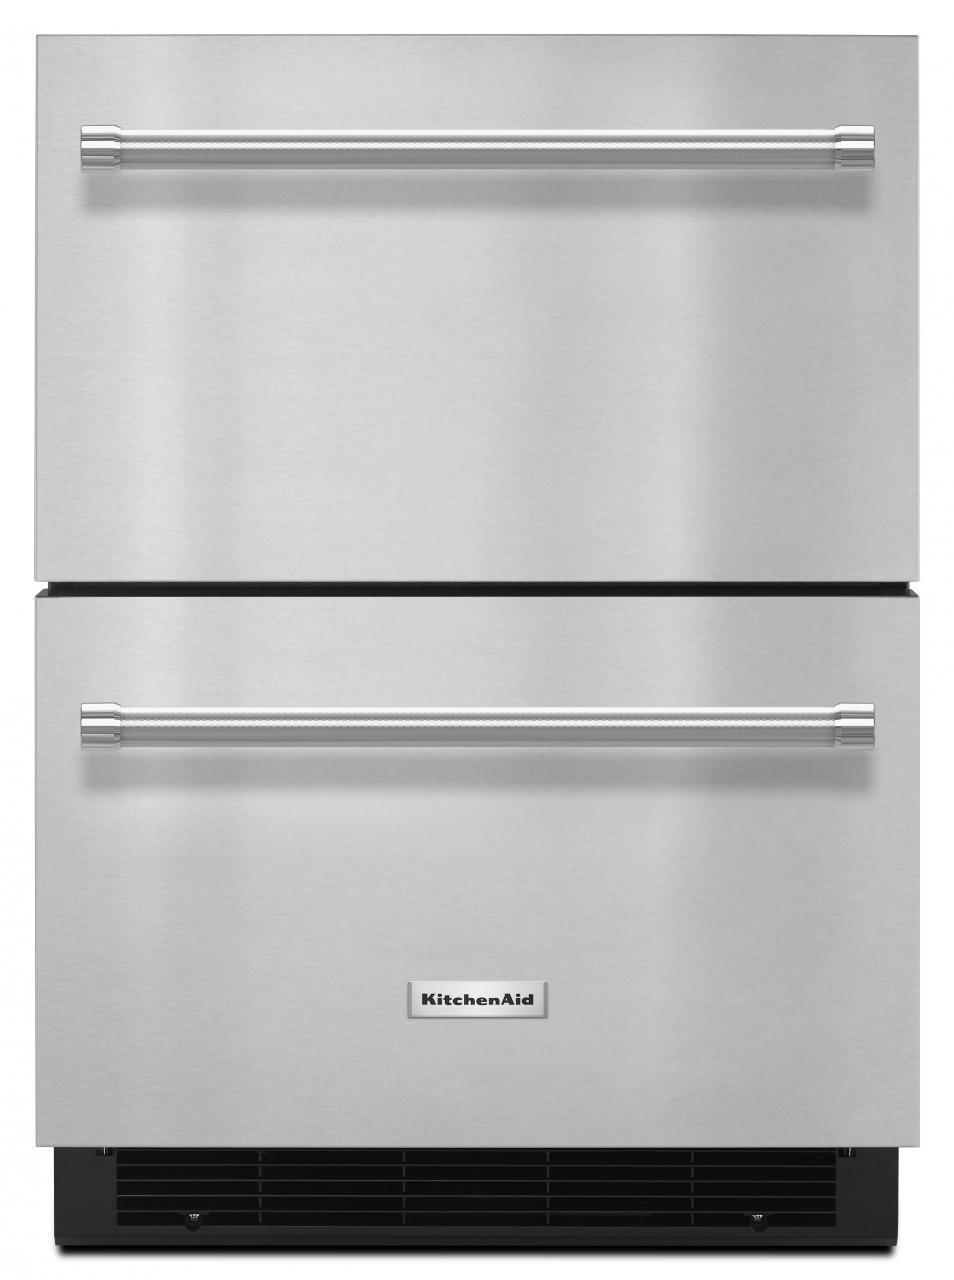 drawers multi drawer kitchenaid original door ft tif refrigerator refrigeration french freezer web bottom cu